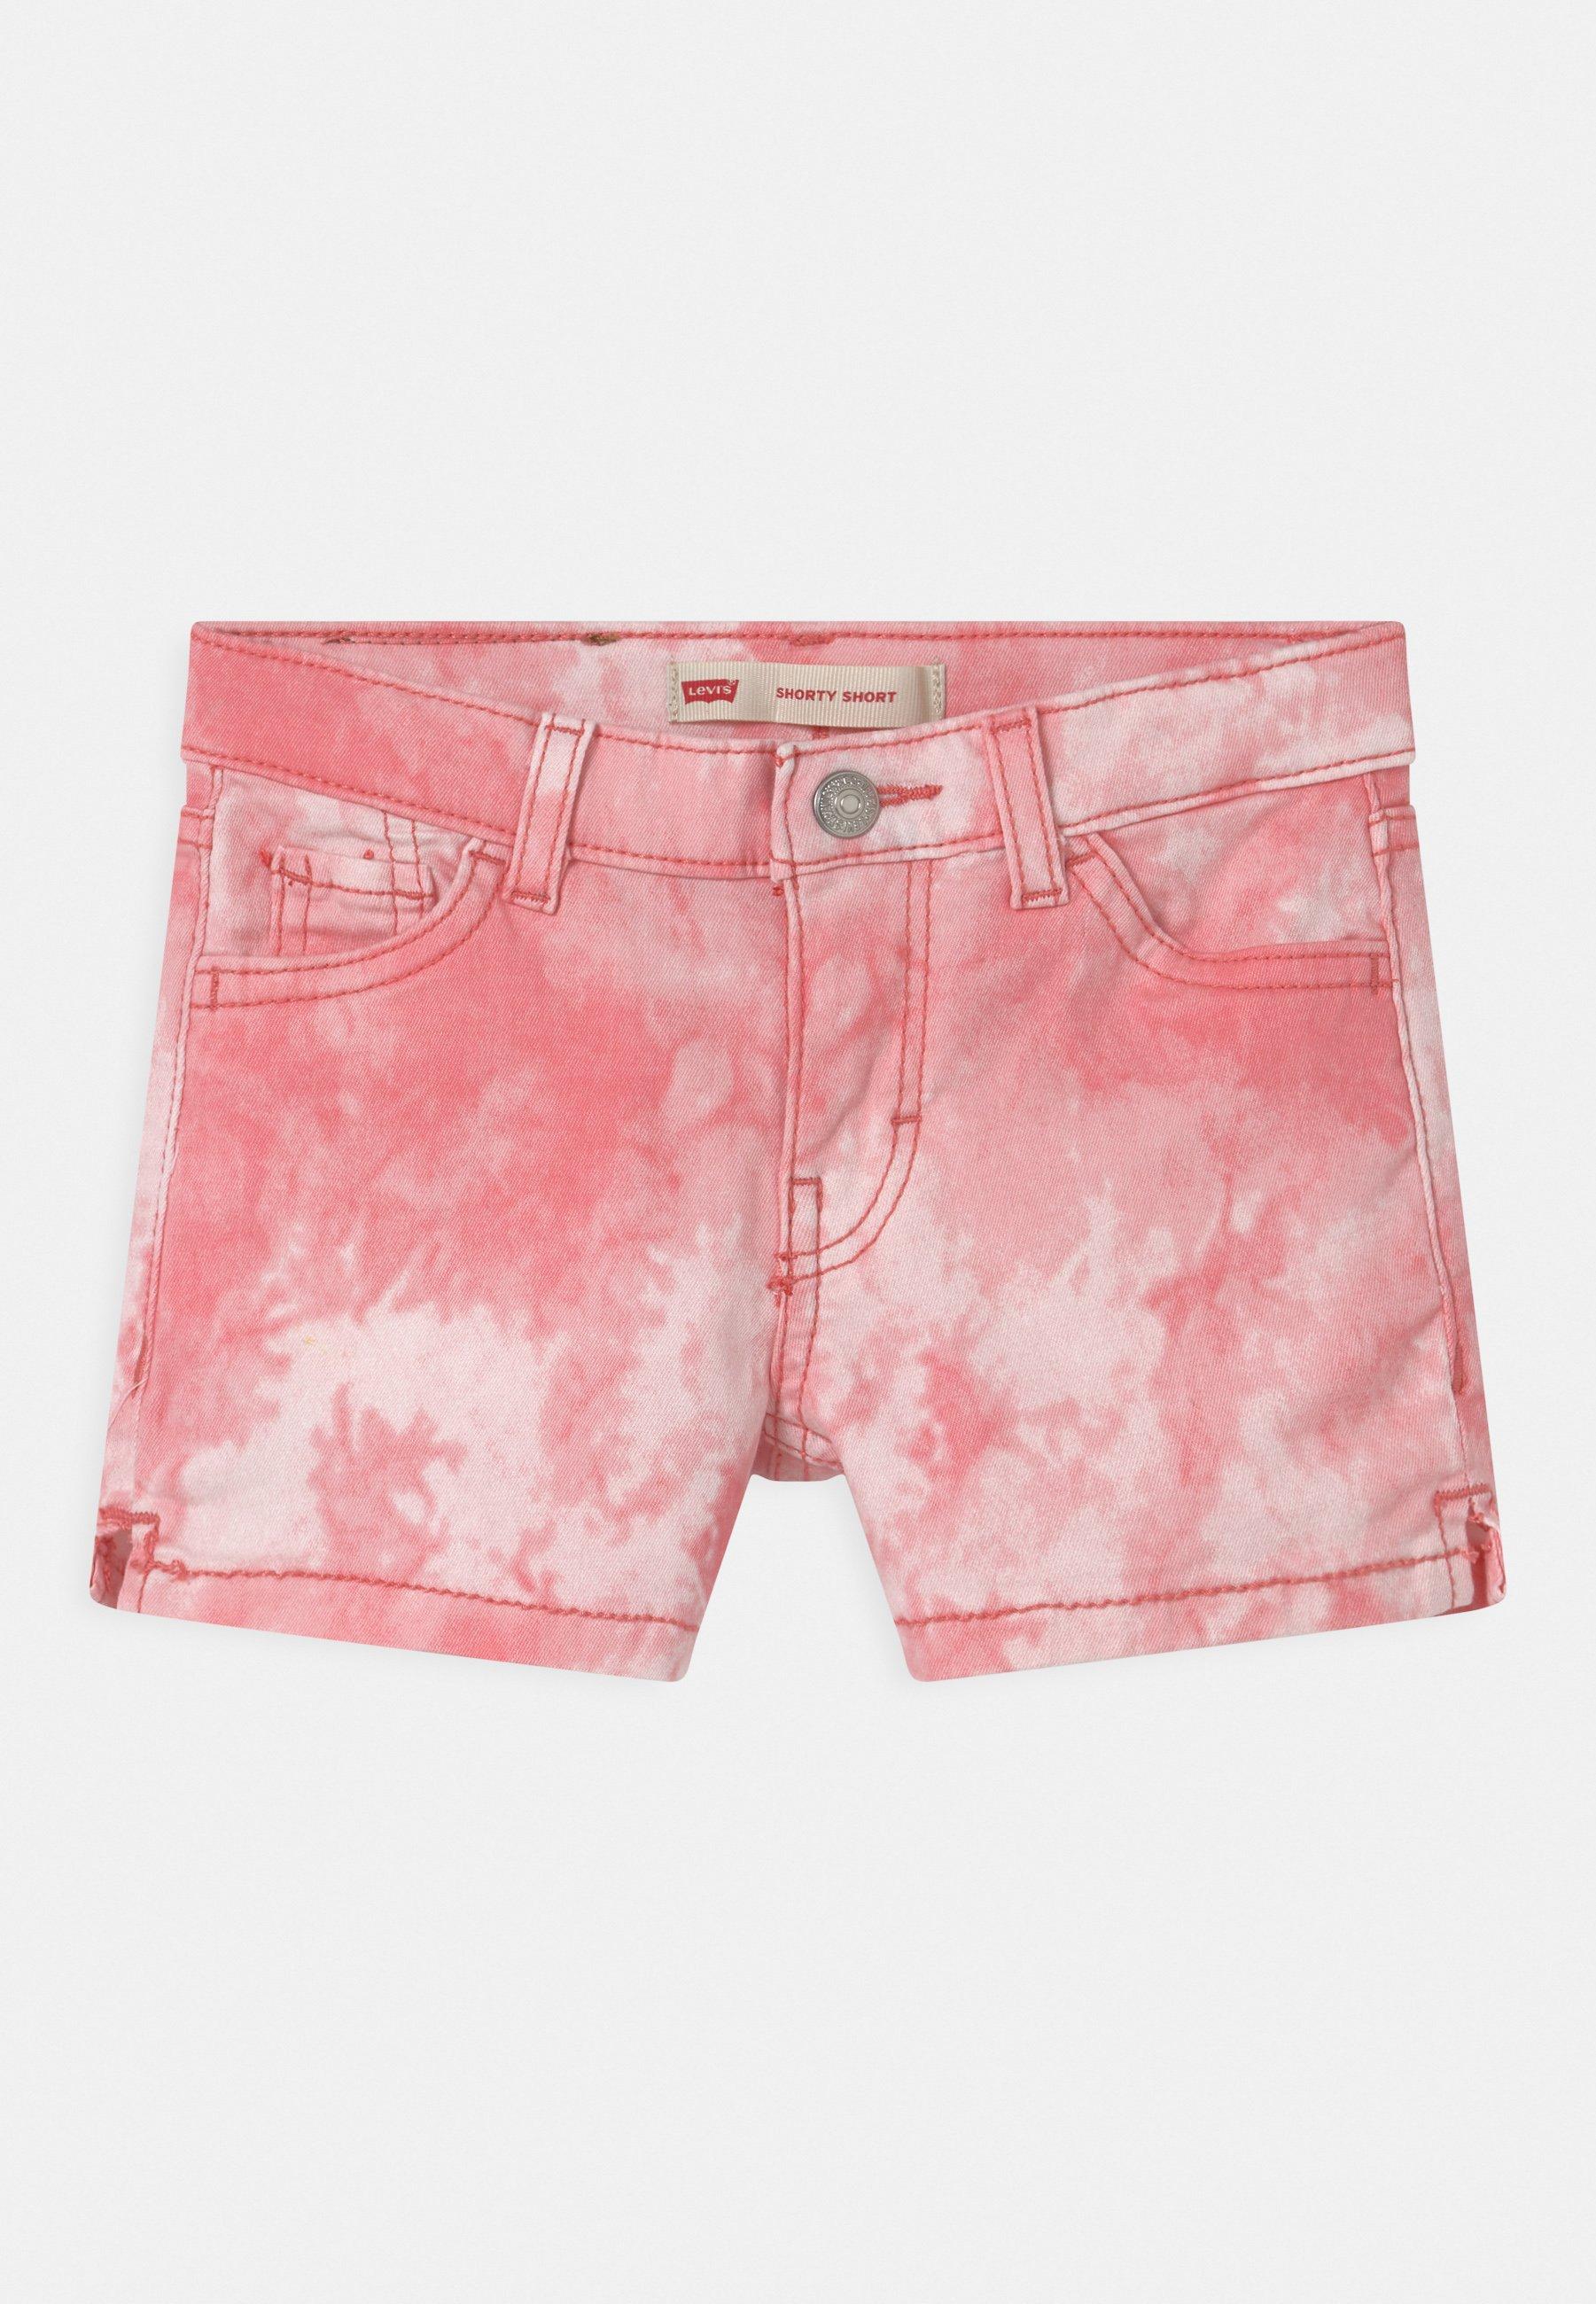 Kinder TIE DYE - Jeans Shorts